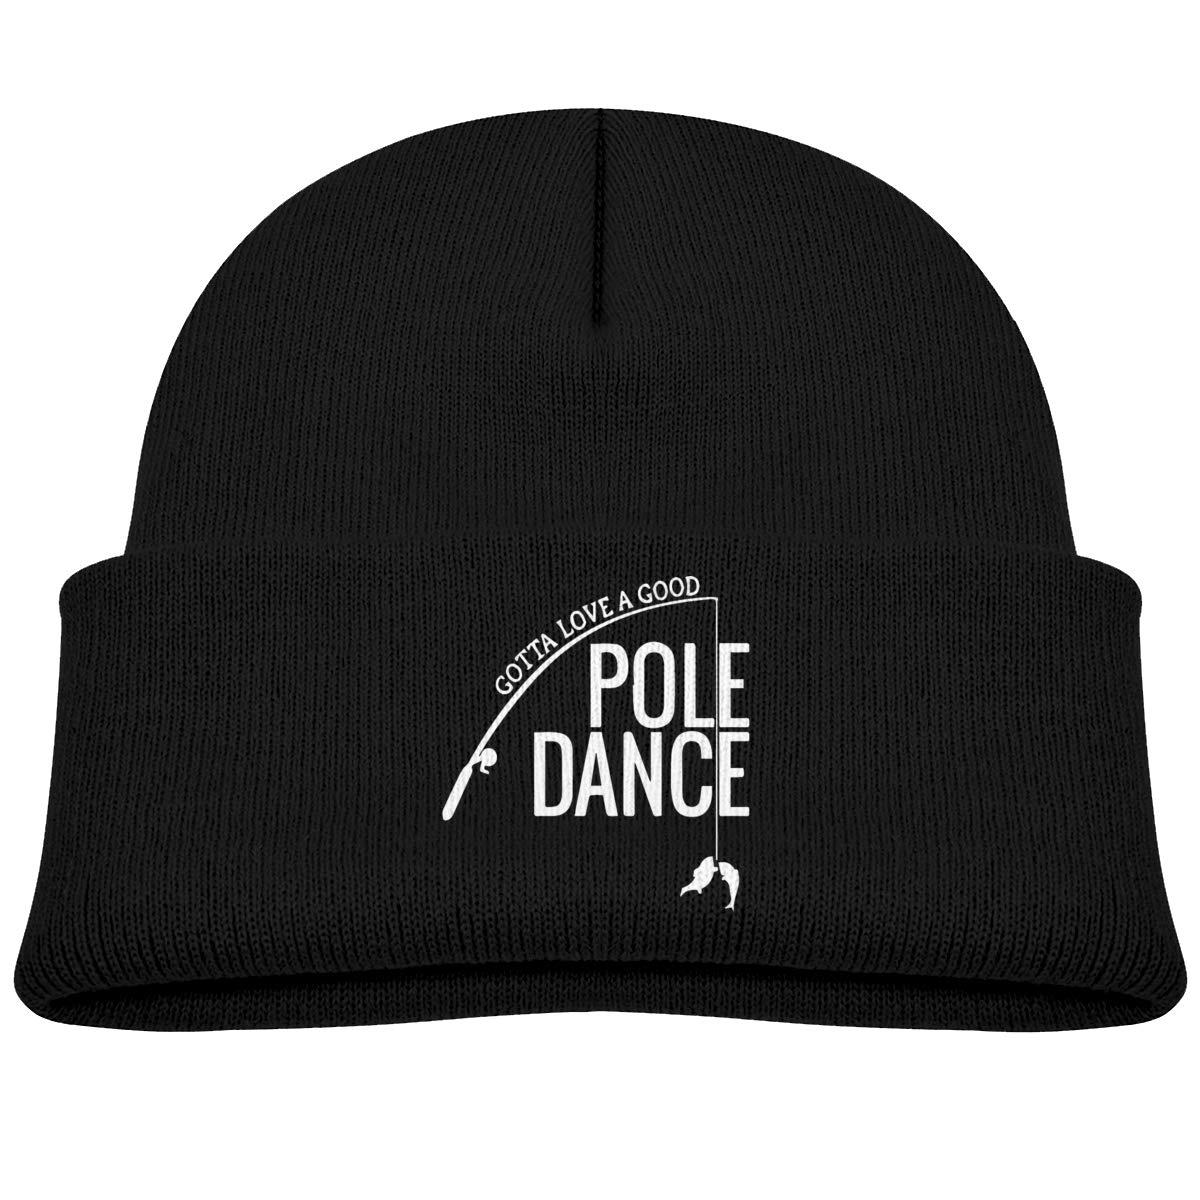 Gotta Love A Good Pole Dance Infant Skull Hats Baby Boy Beanies Cap